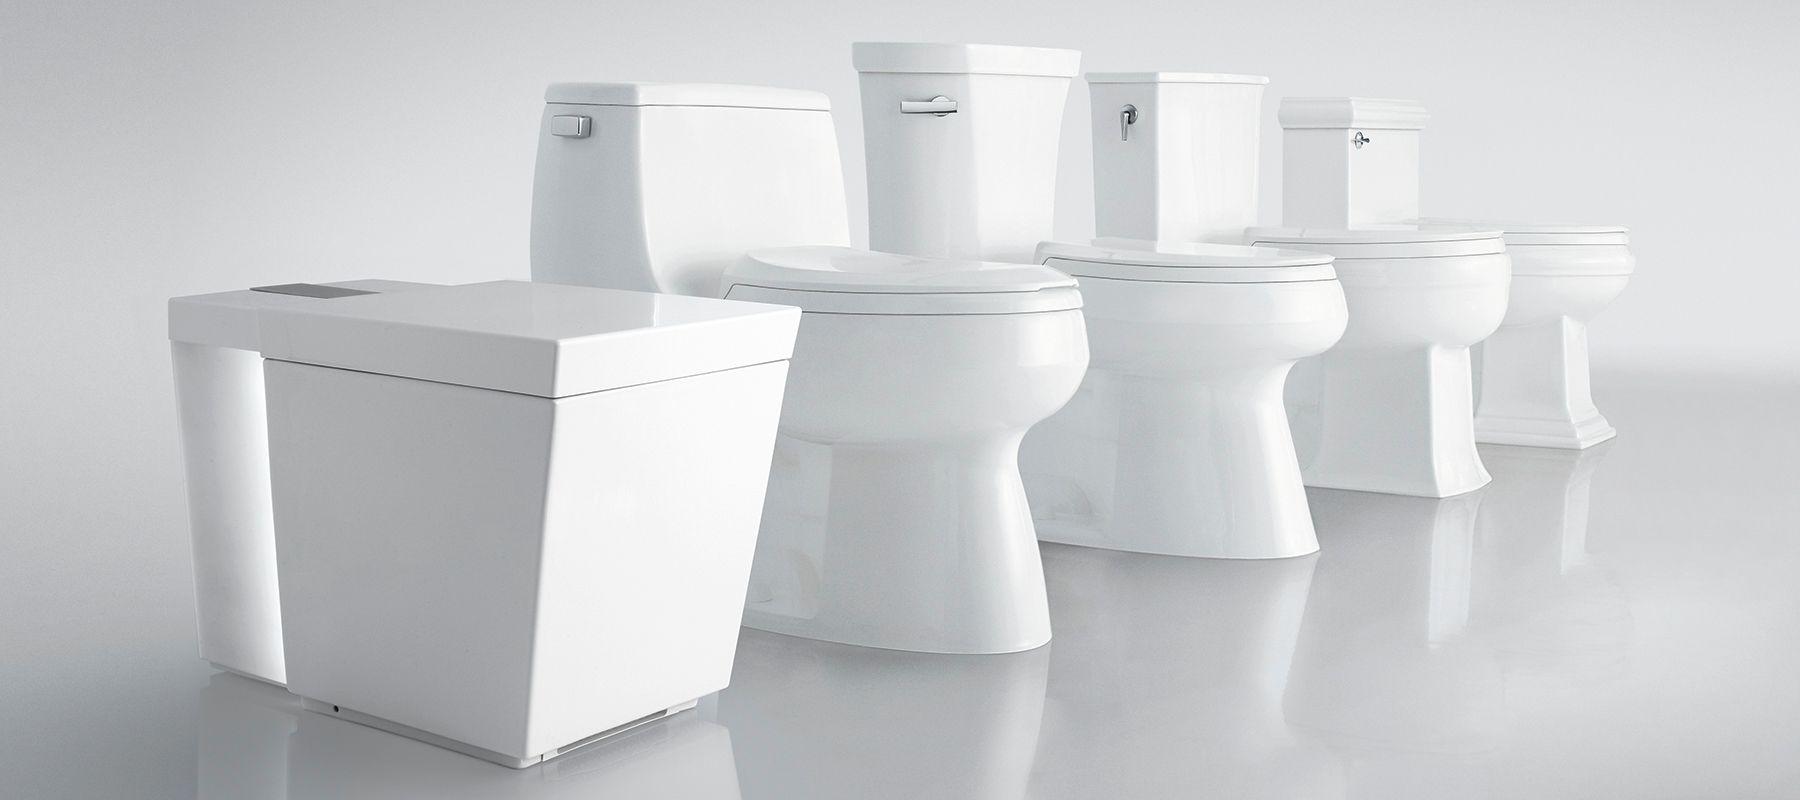 toilets-